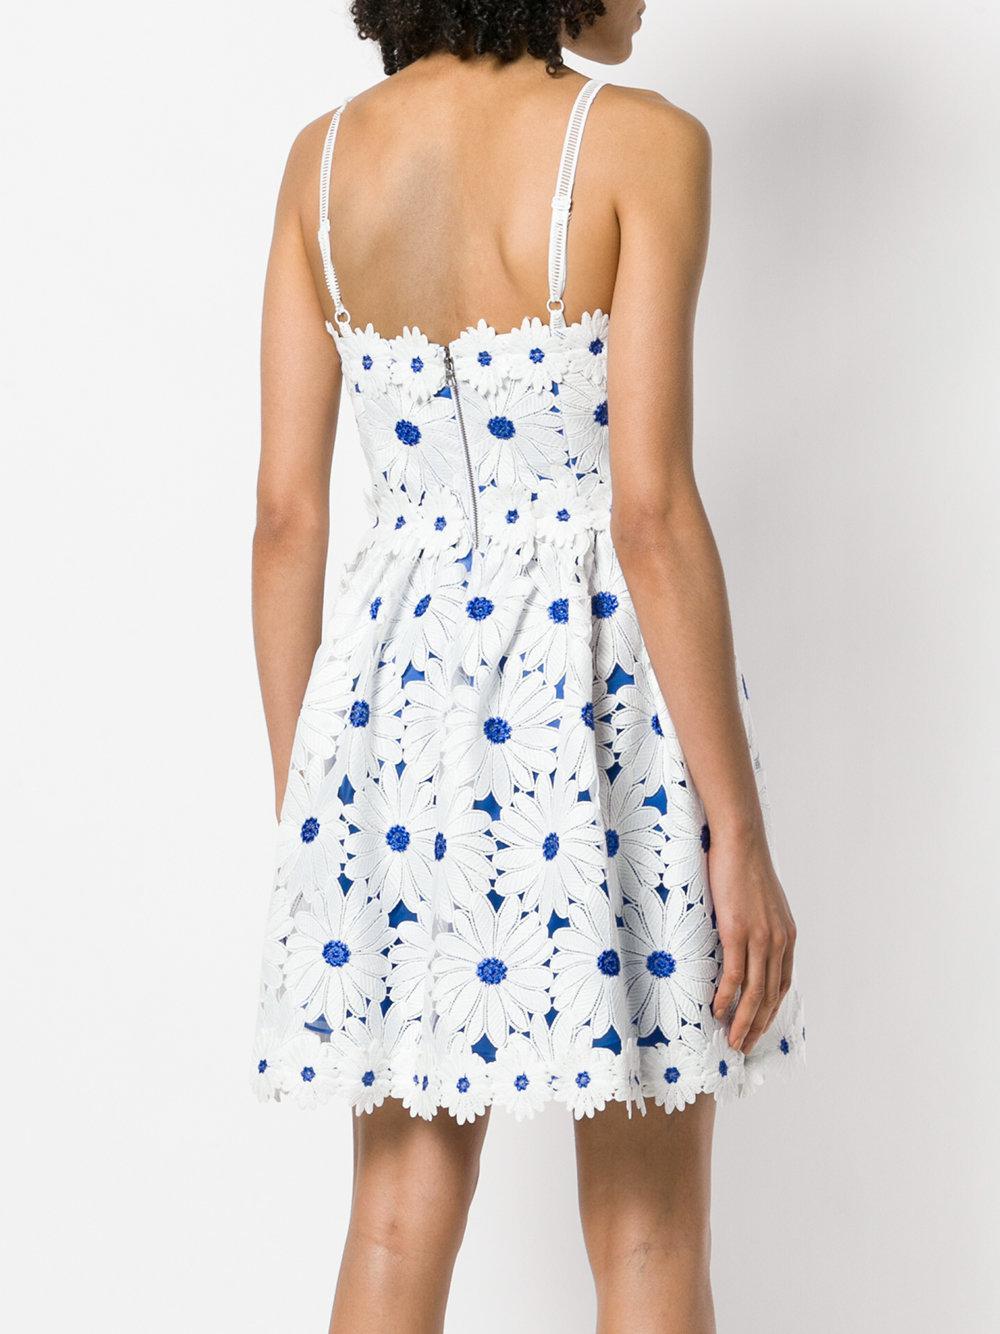 Lyst alice olivia flower appliqu sun dress in white izmirmasajfo